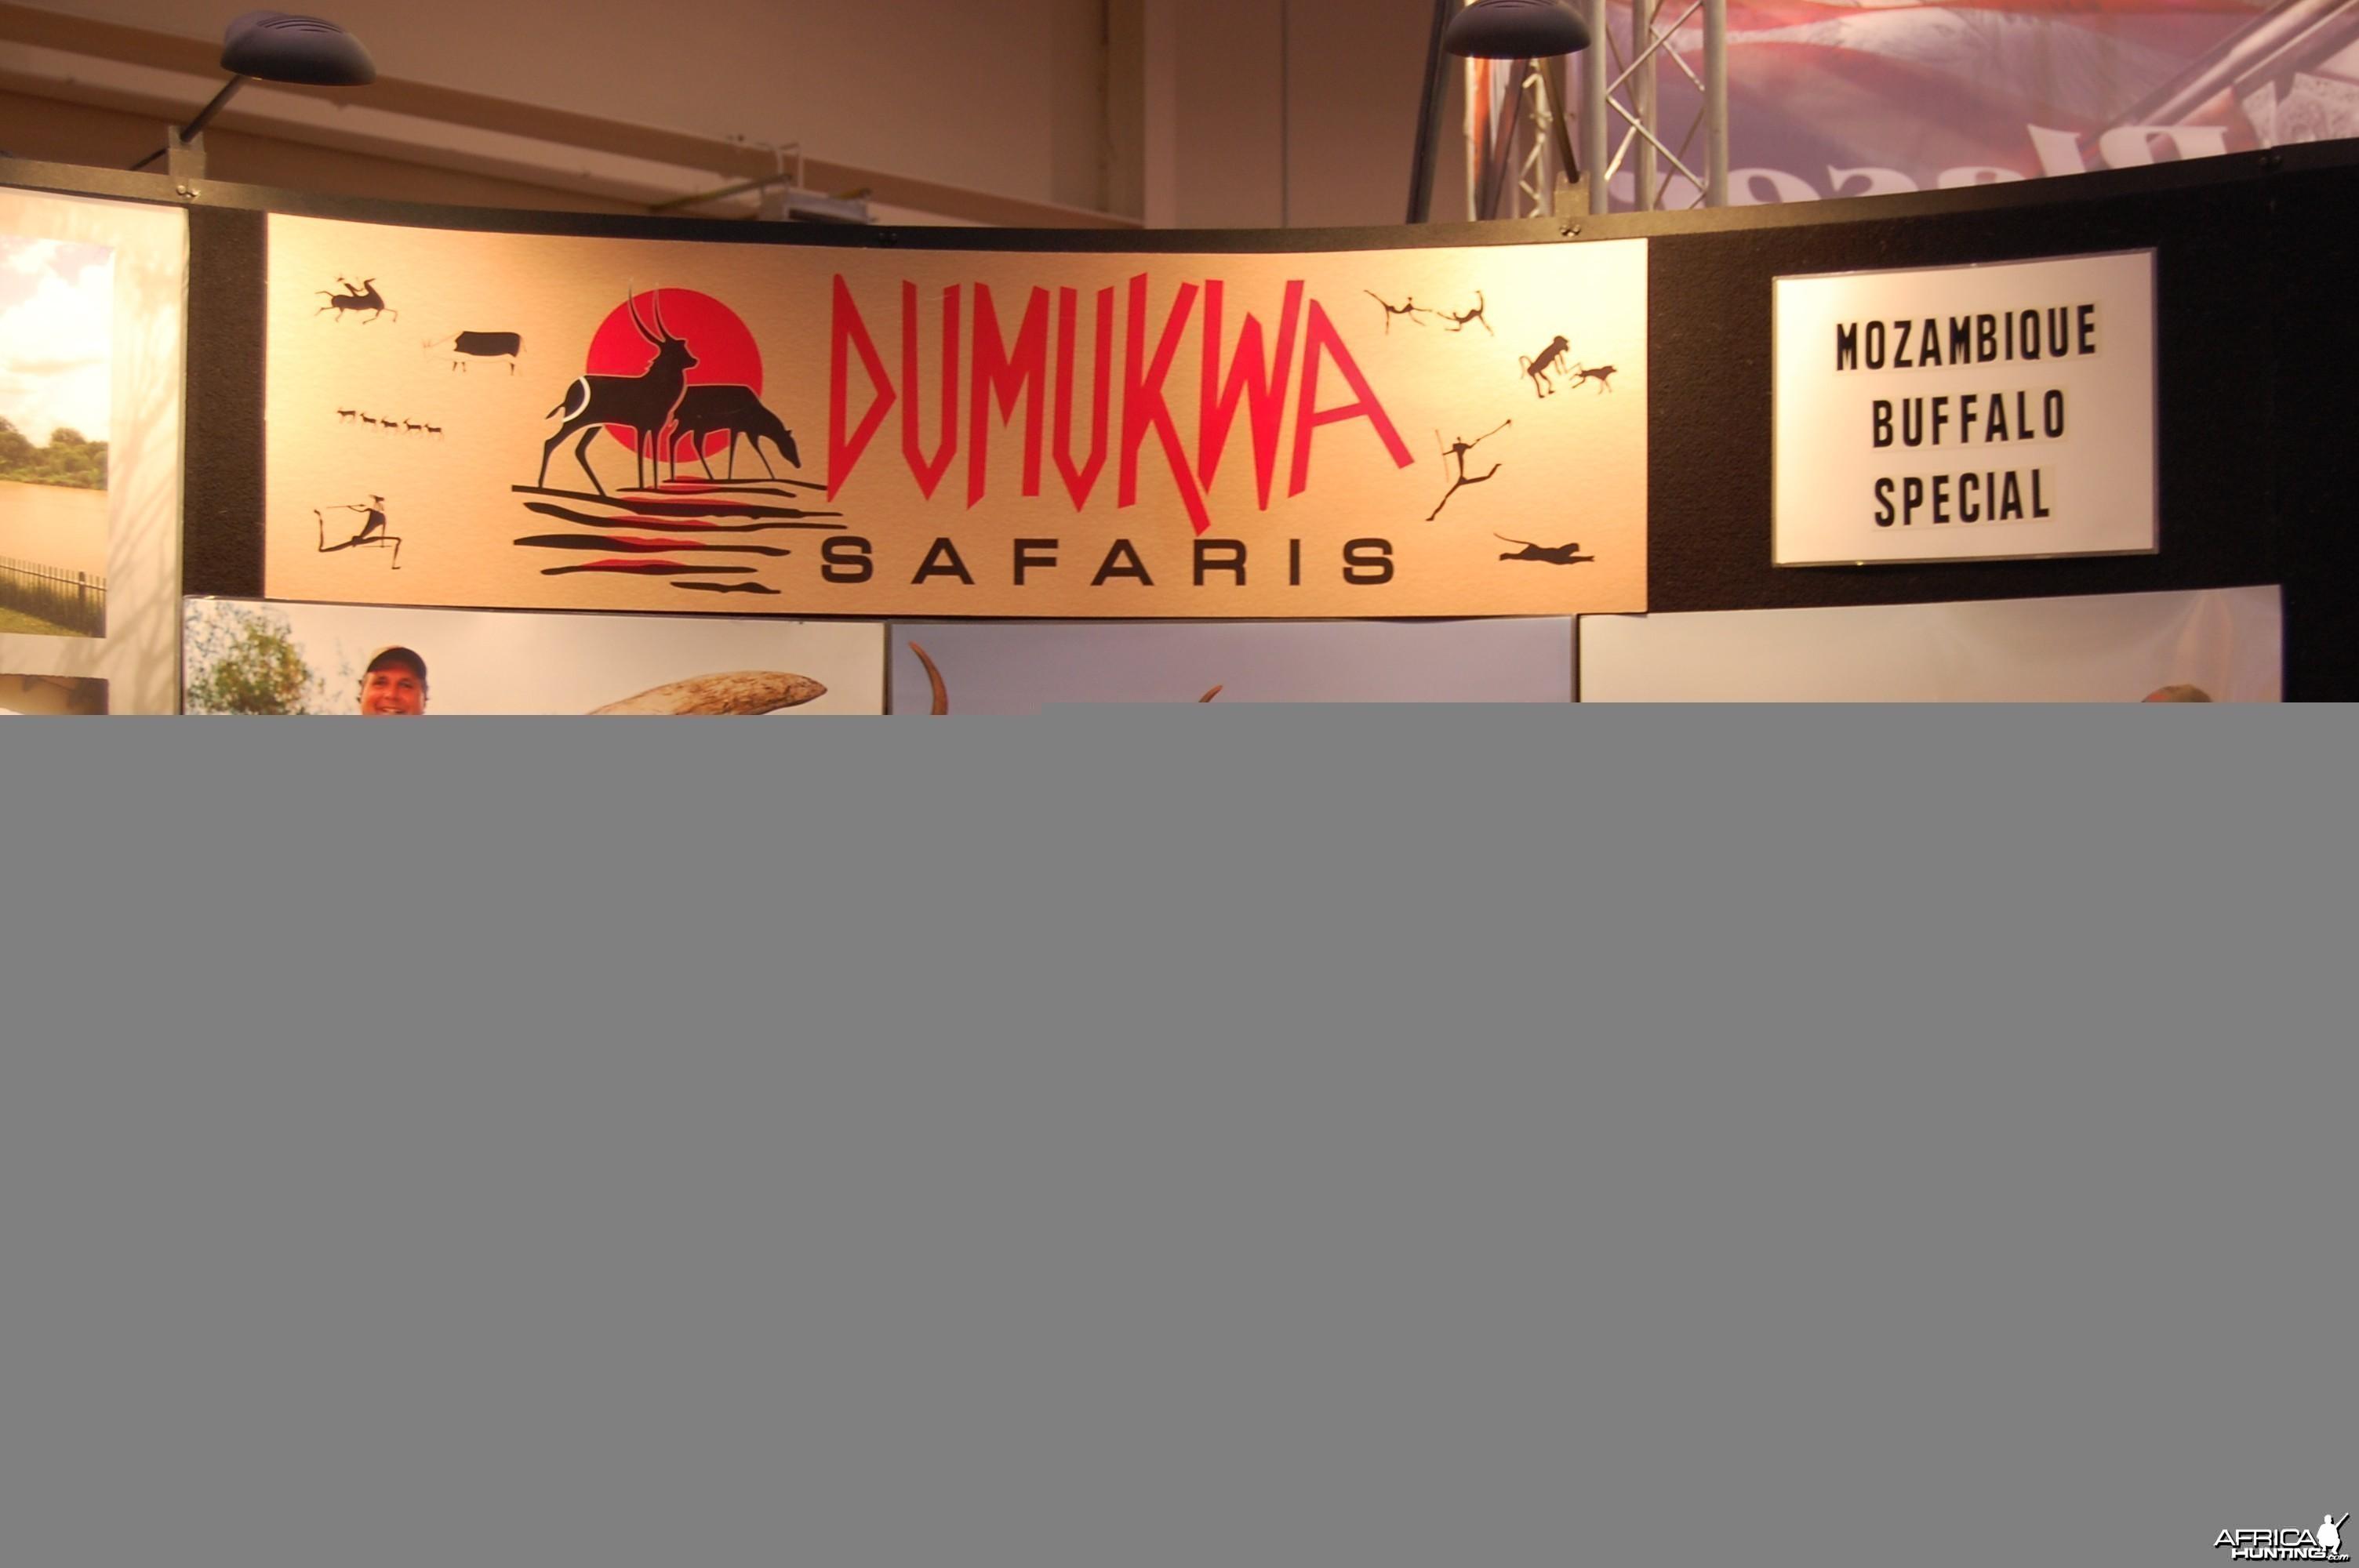 Dumukwa Safaris